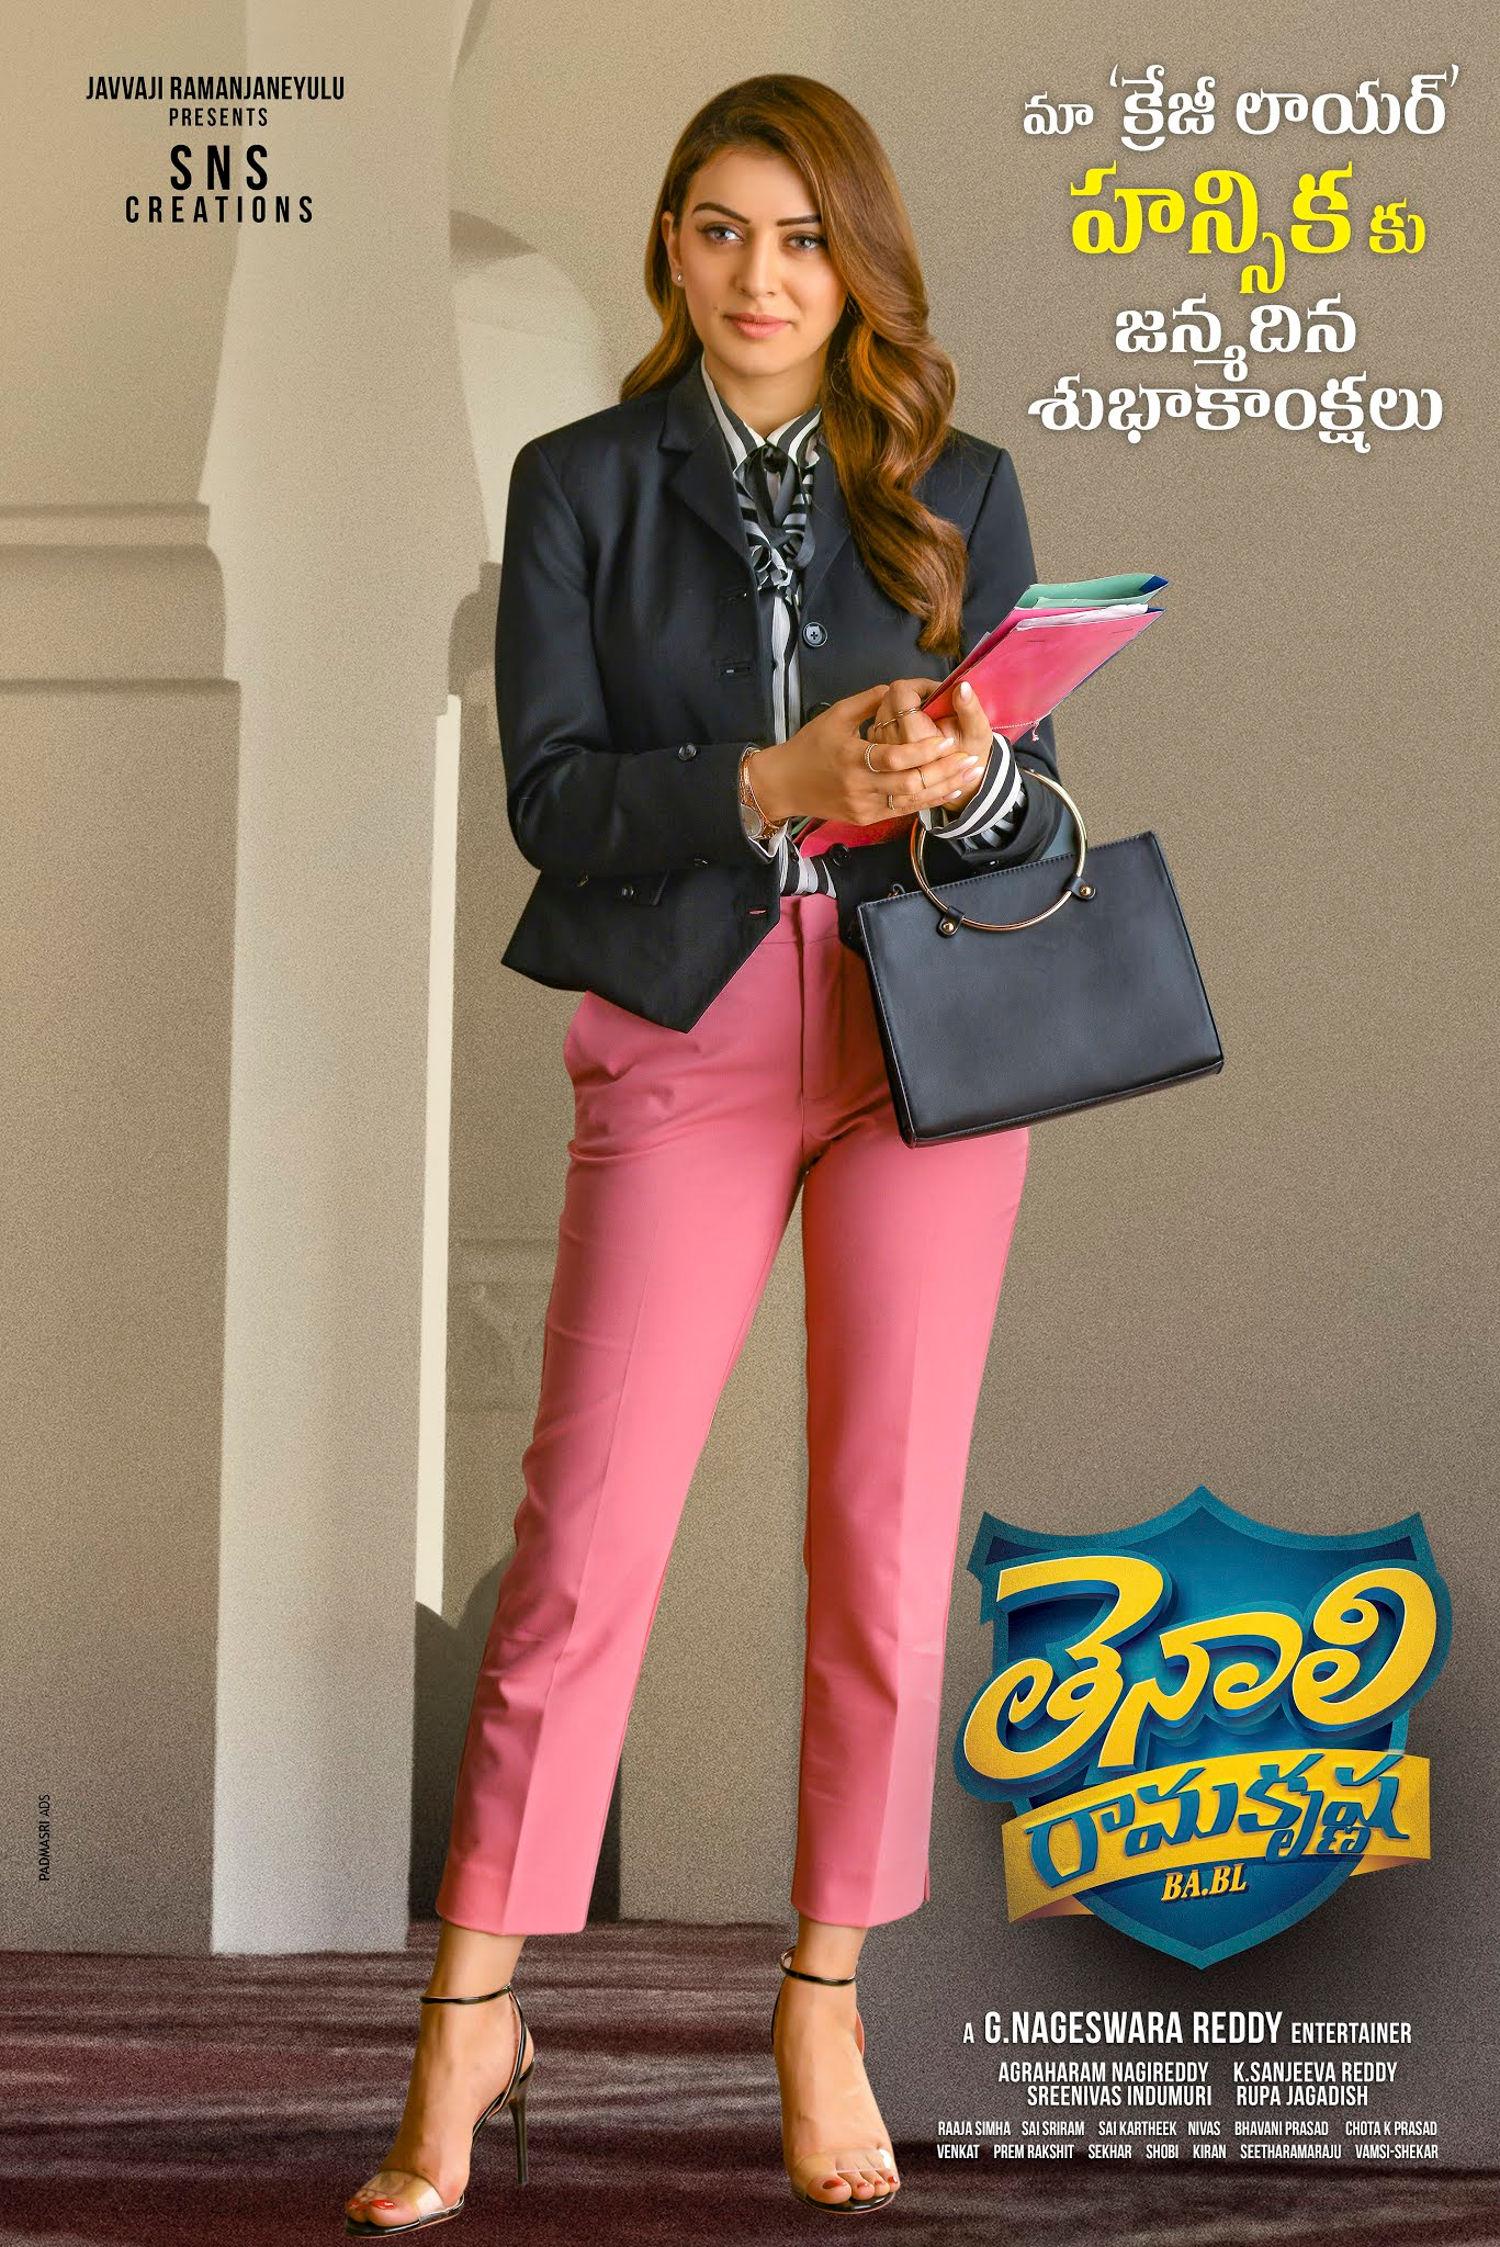 Tenali Ramakrishna BA BL Movie Actress Hansika Motwani Birthday Special Poster HD